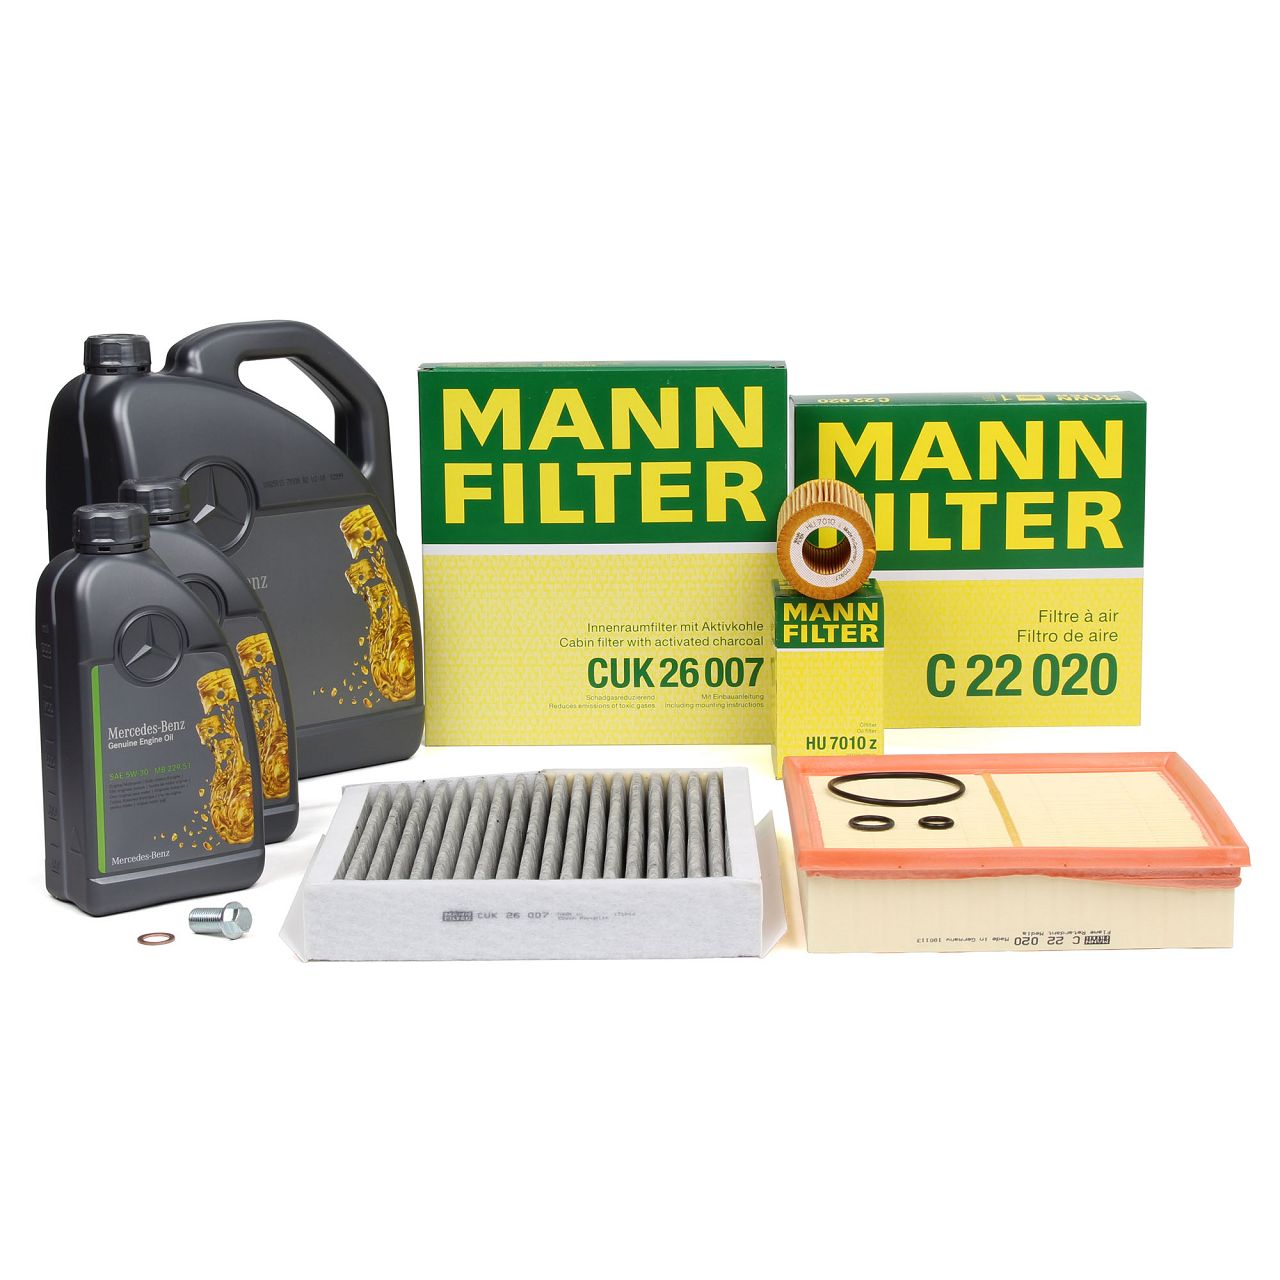 MANN Filterset + 7 L ORIGINAL Mercedes 5W30 Motoröl A-Klasse W176 B-Klasse W246 180-220CDI